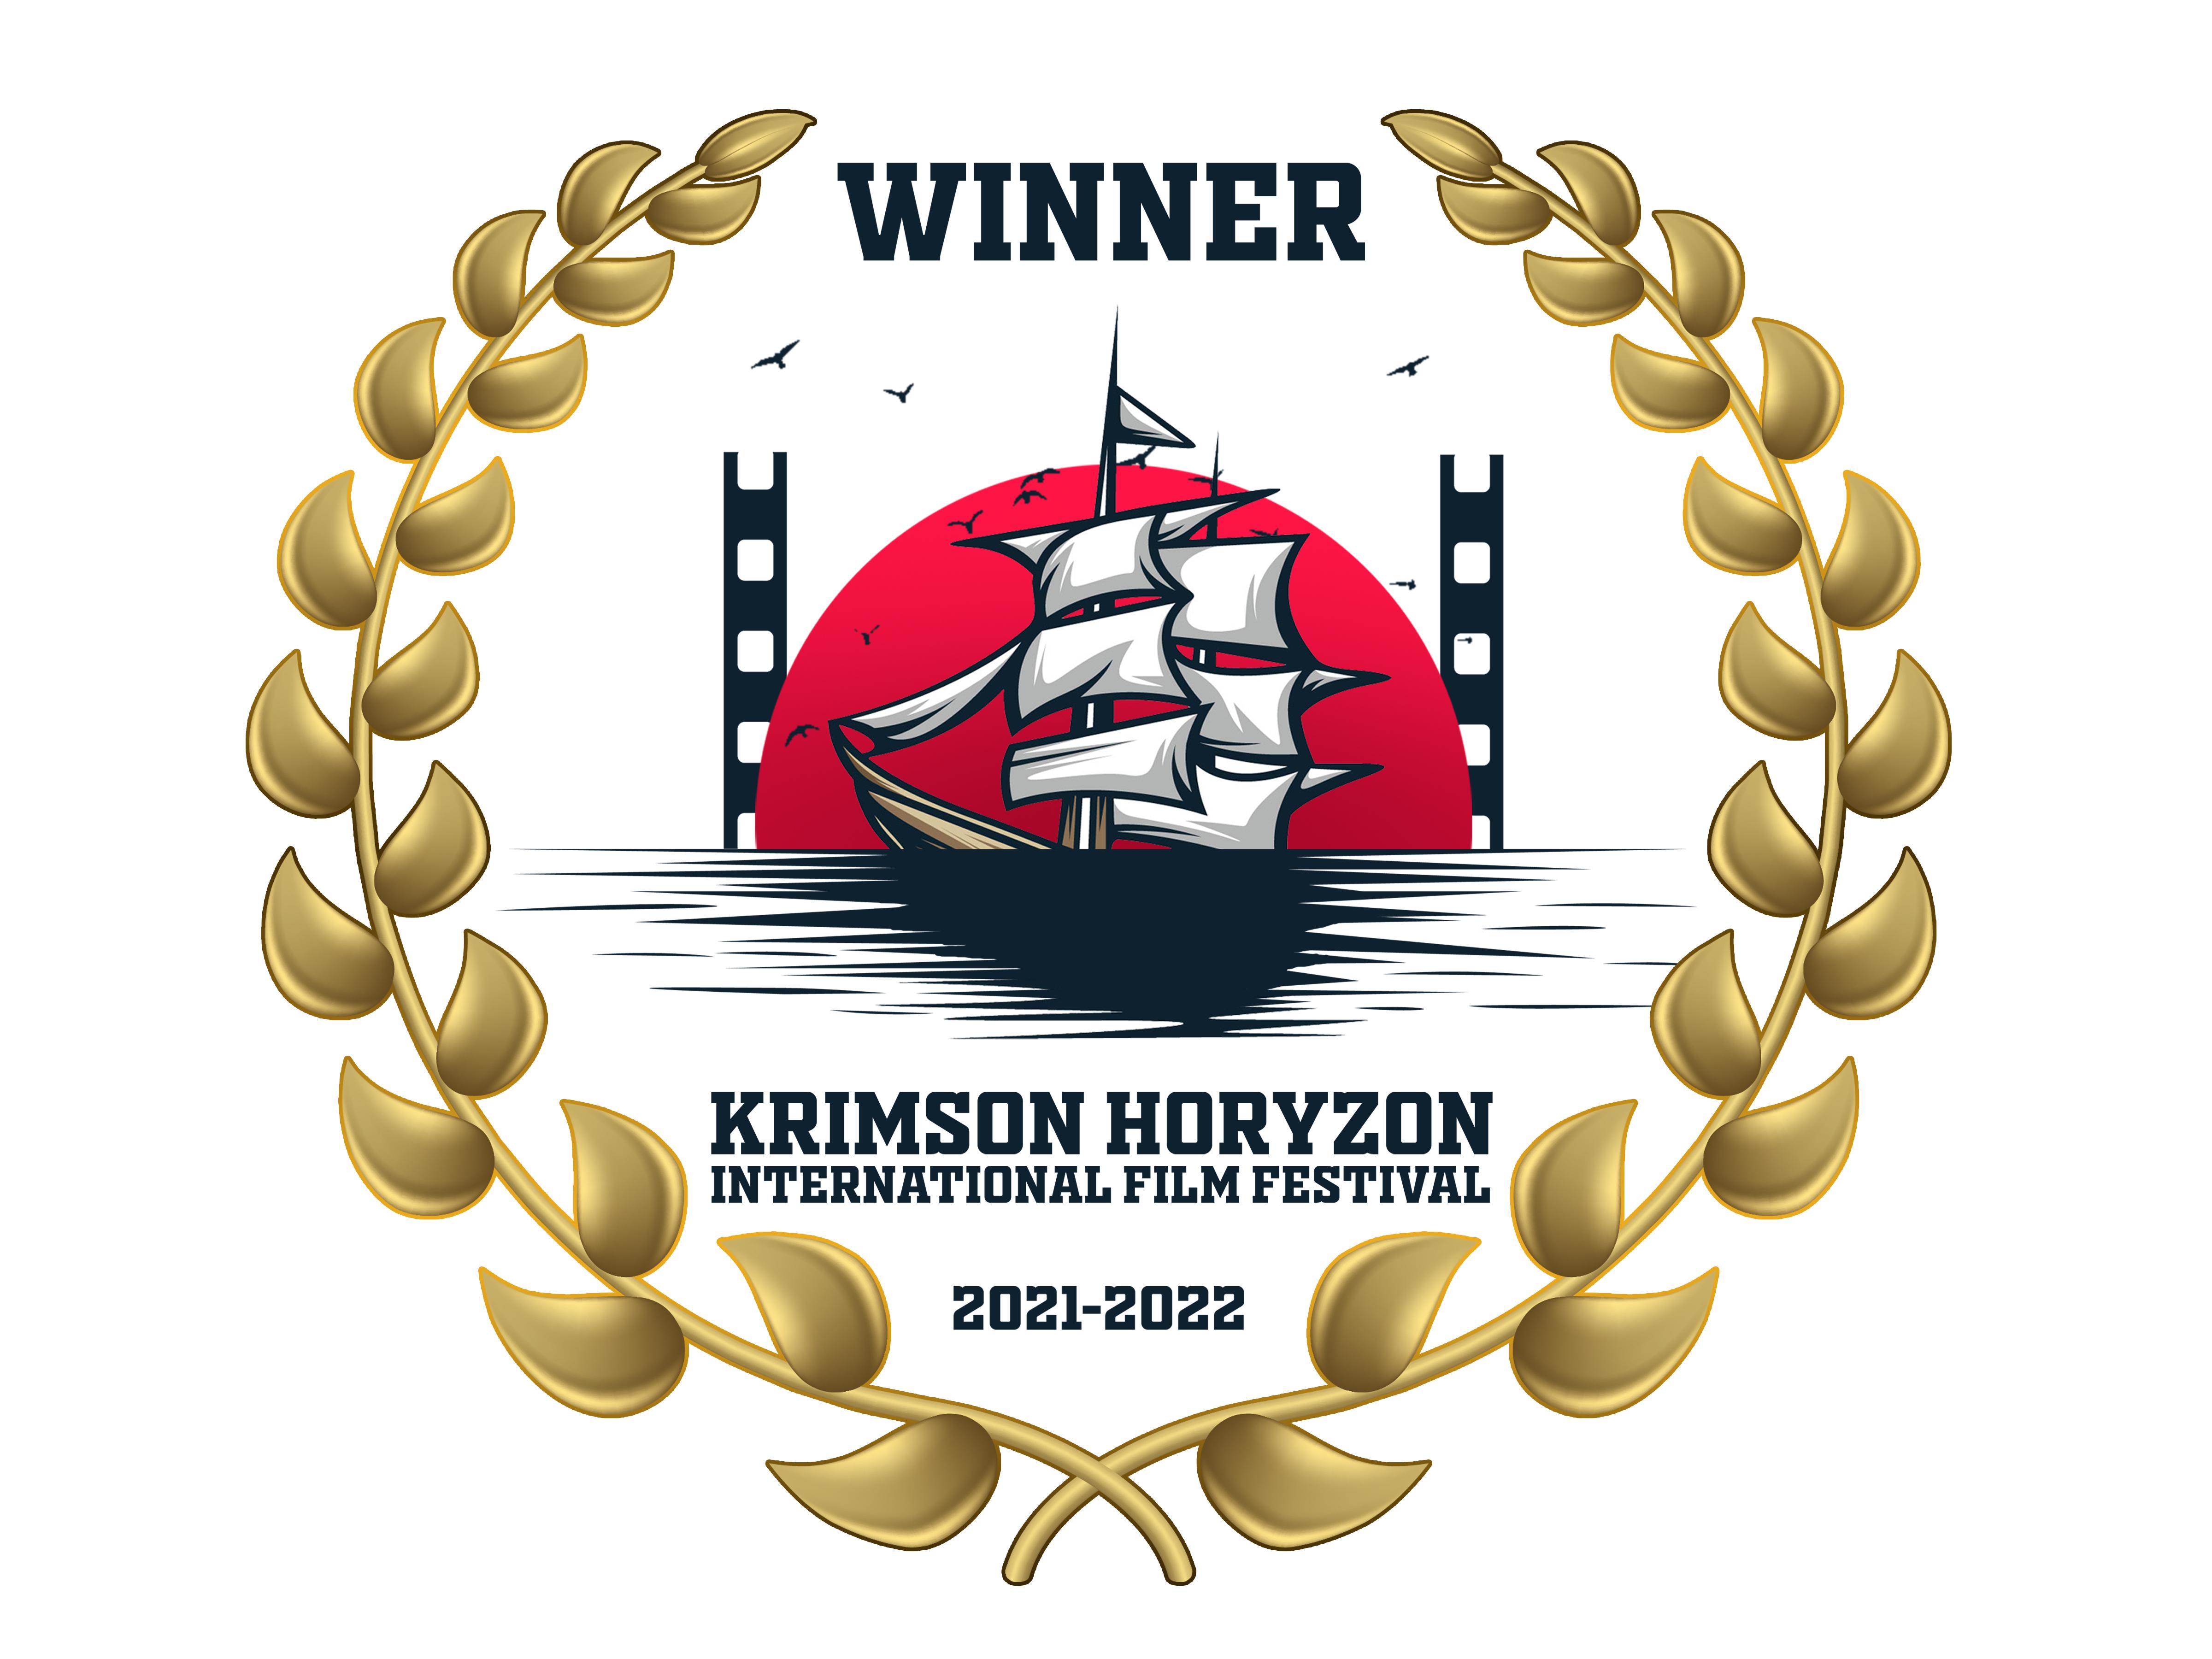 KrimsonHoryzenIntlFilmFestival - Best Short Film